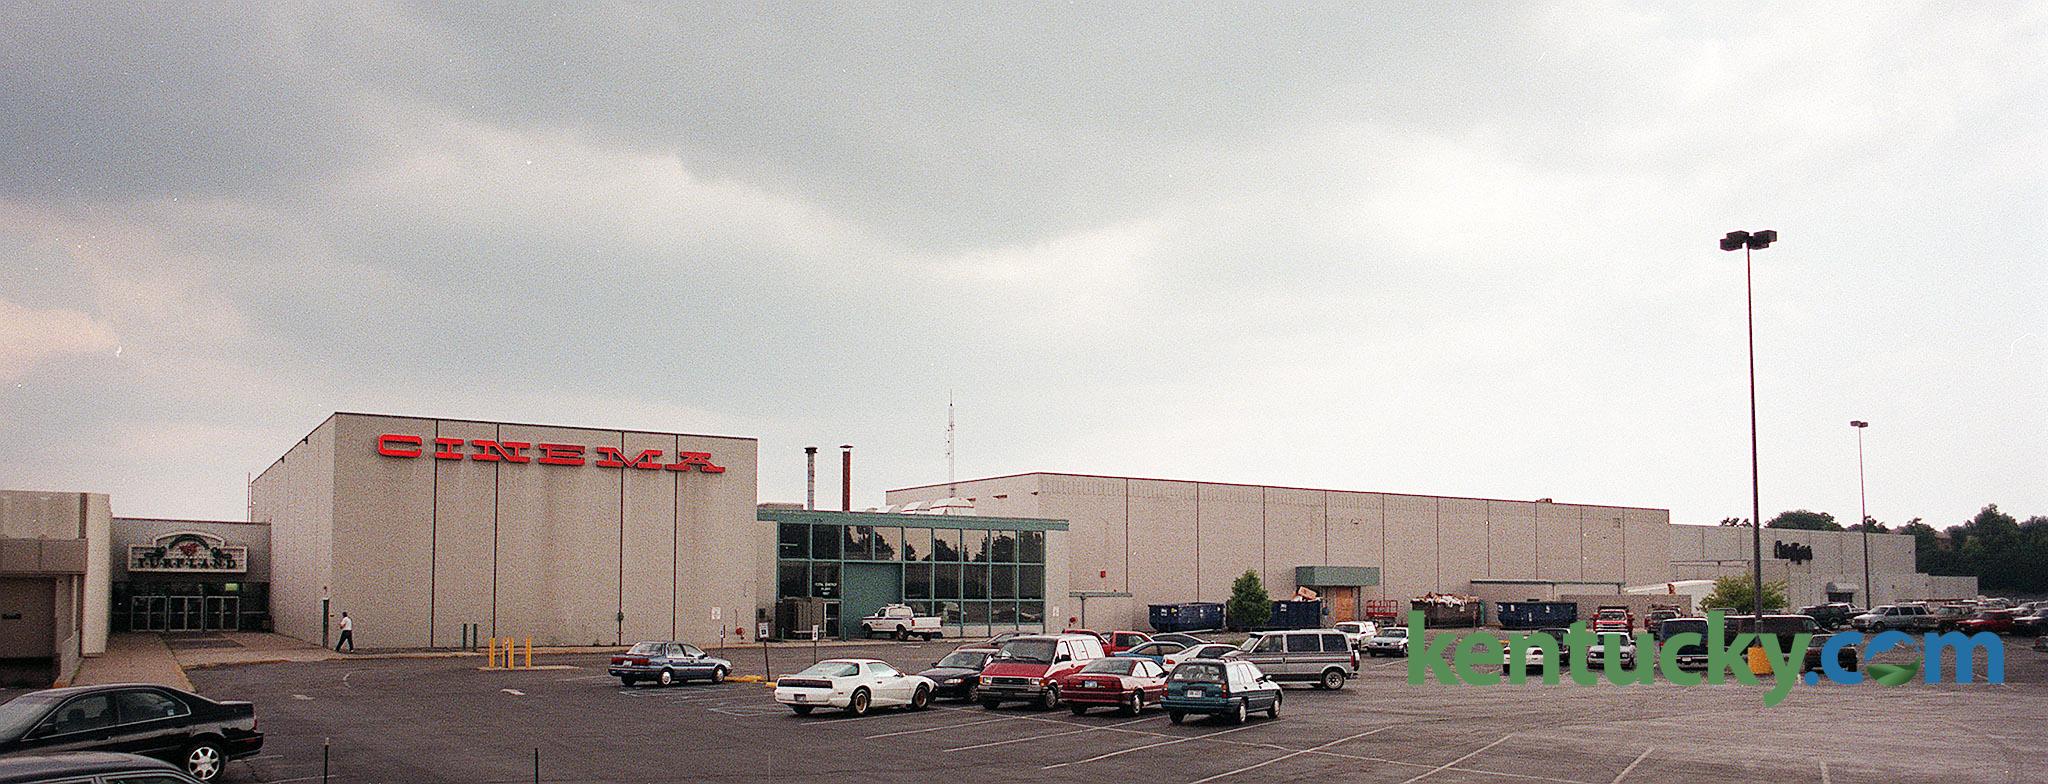 Turfland Mall cinema, 1998 | Kentucky Photo Archive